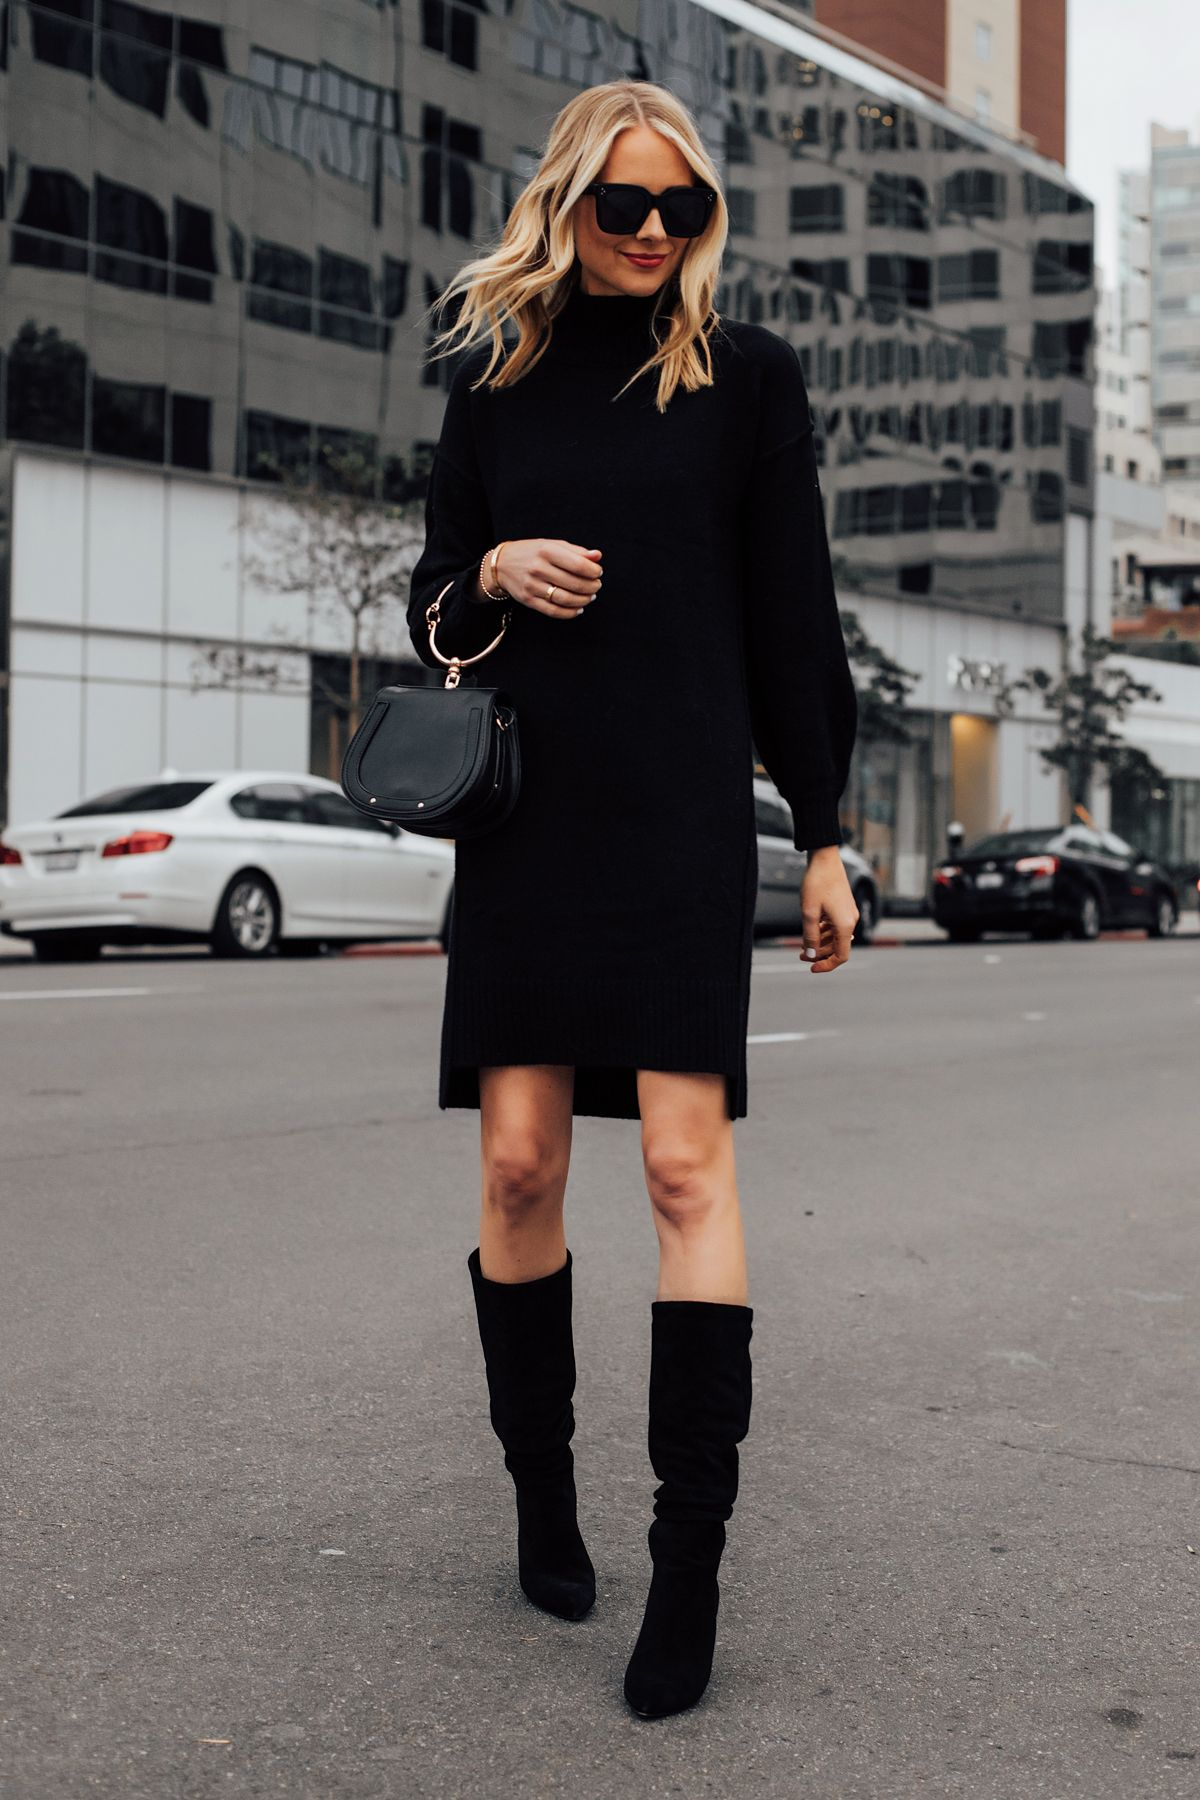 Blonde Woman Wearing Black Sweater Dress Black Tall Boots Black Clutch Handbag Fashion Jackson San Diego Fashion Blogge Fashion Jackson Fashion Fashion Outfits [ 1800 x 1200 Pixel ]